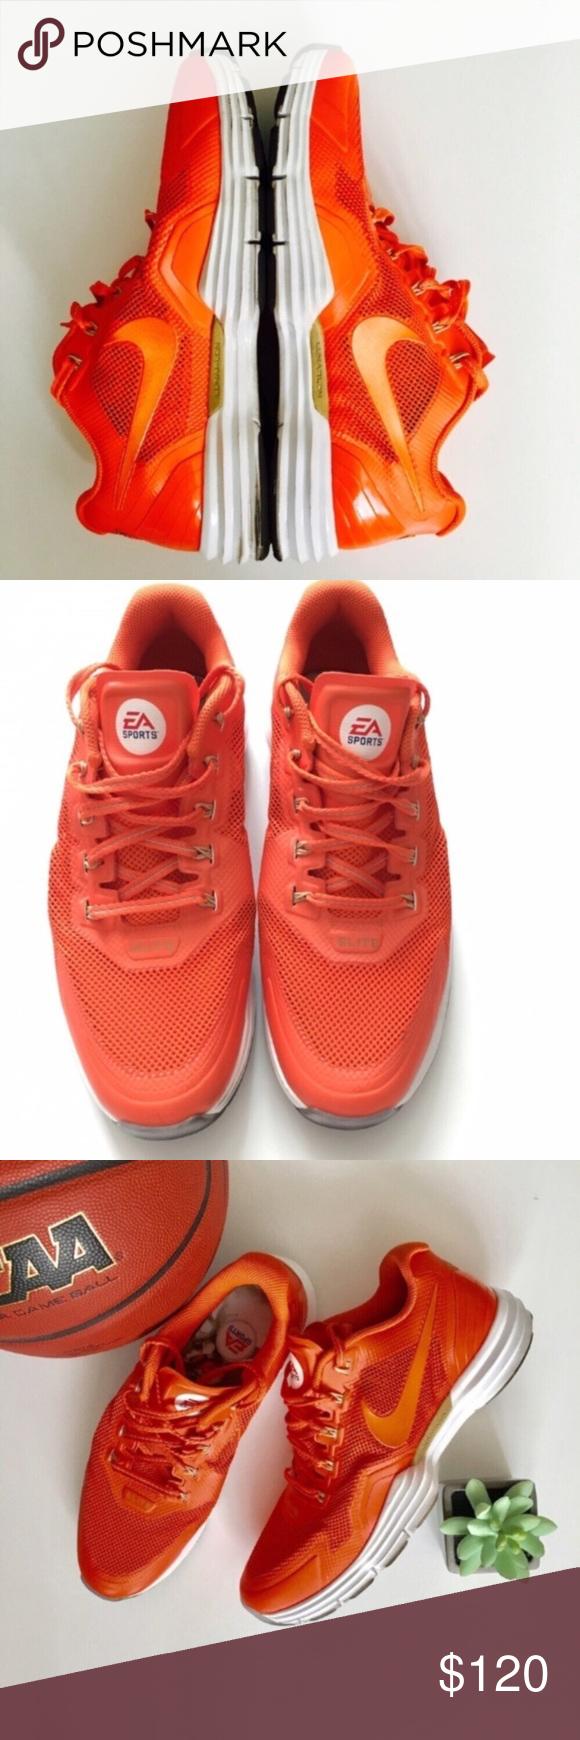 Nike Barry Sanders Nike Lunar TR1 EA NCAA Football Nike Barry Sanders Nike  Lunar TR1 EA 032fe2afab